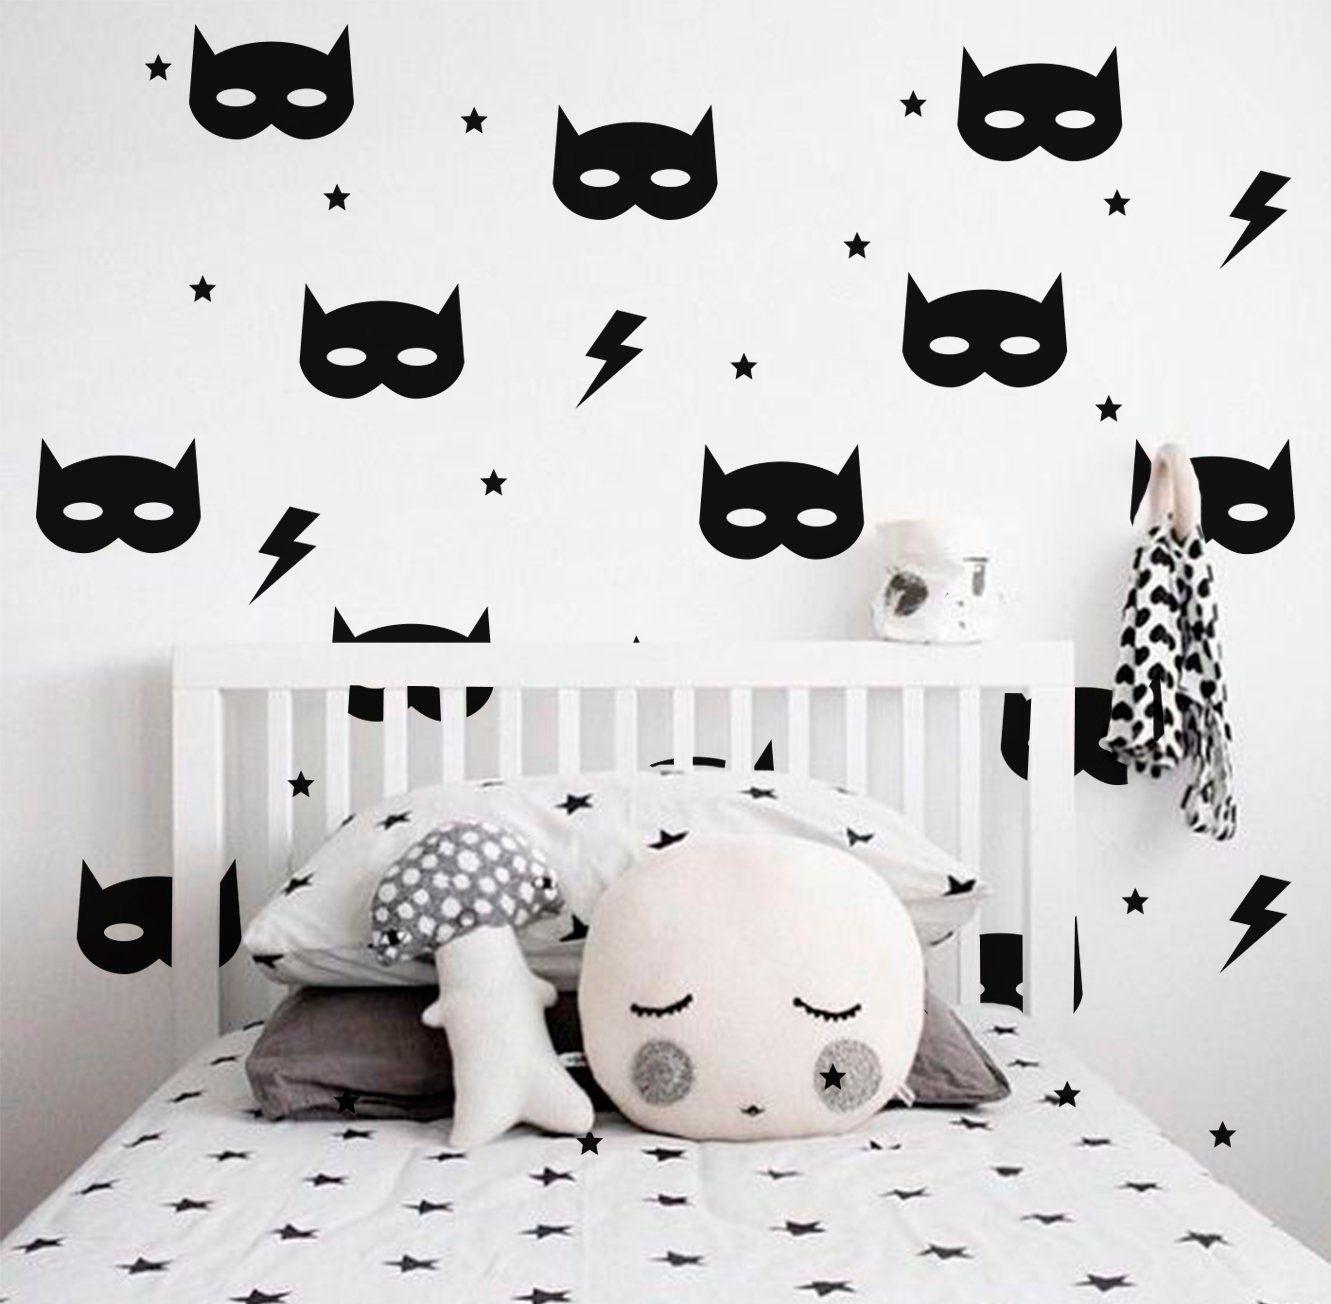 Batman Mask Wall Decal Boys Room Decal Batman Mask Vinyl Decal